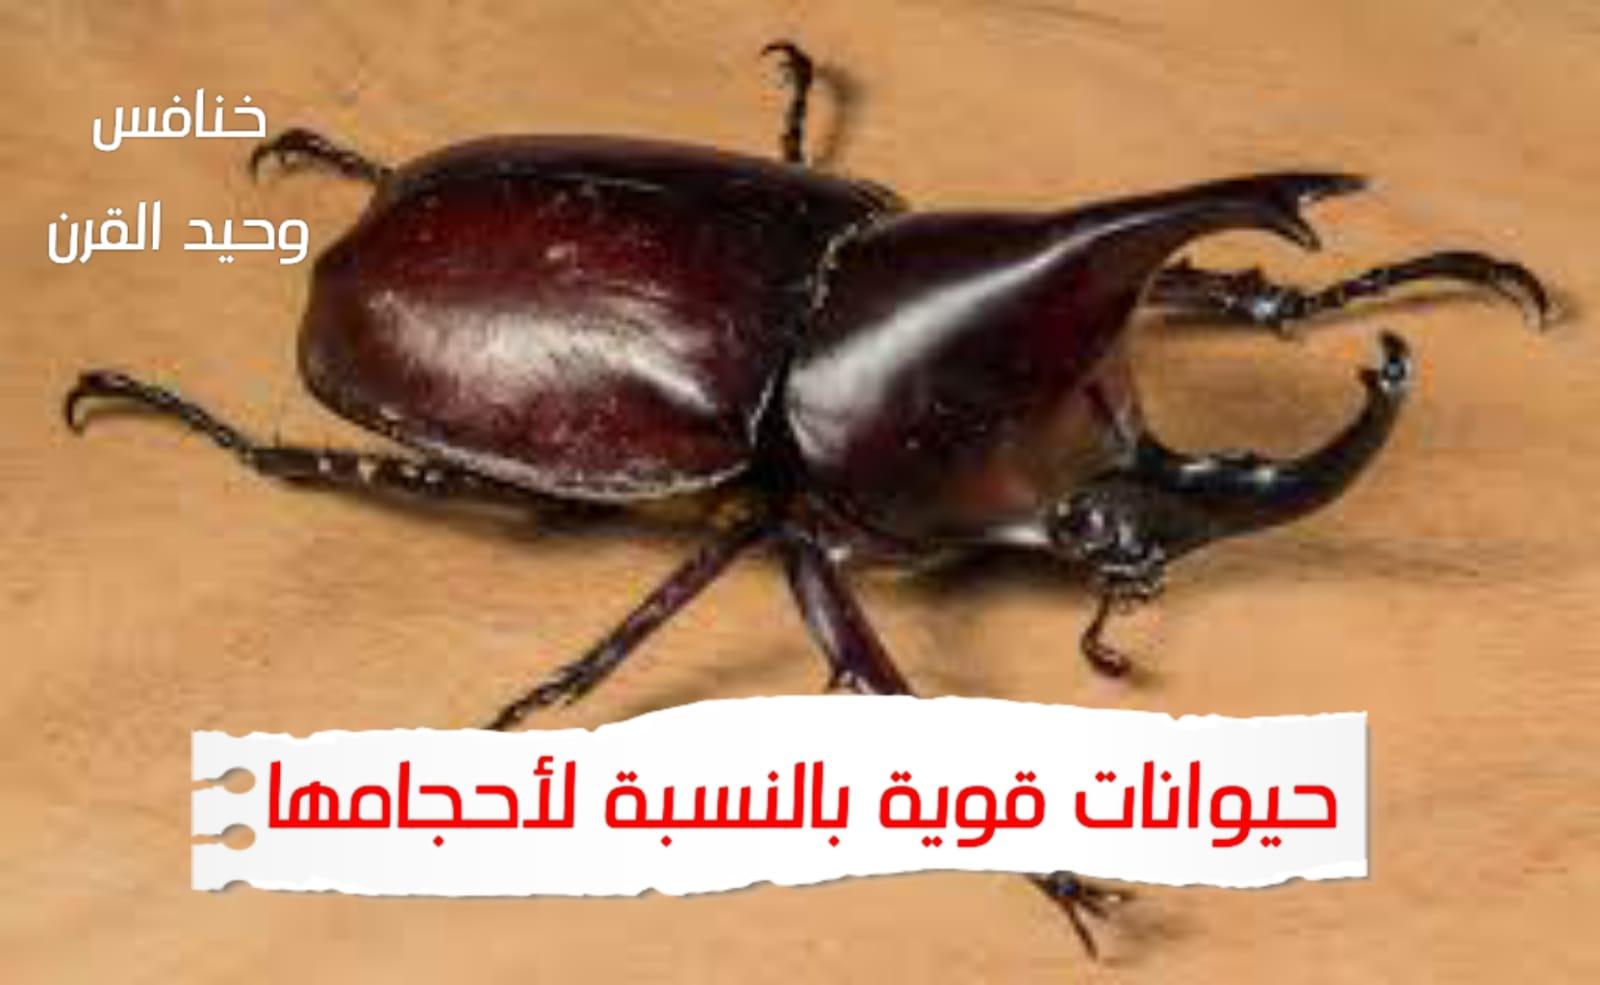 WhatsApp Image 2020 06 23 at 10.23.58 PM - حيوانات صغيرة لاكنها قوية - حيوانات قوية بالنسبة لأحجامها